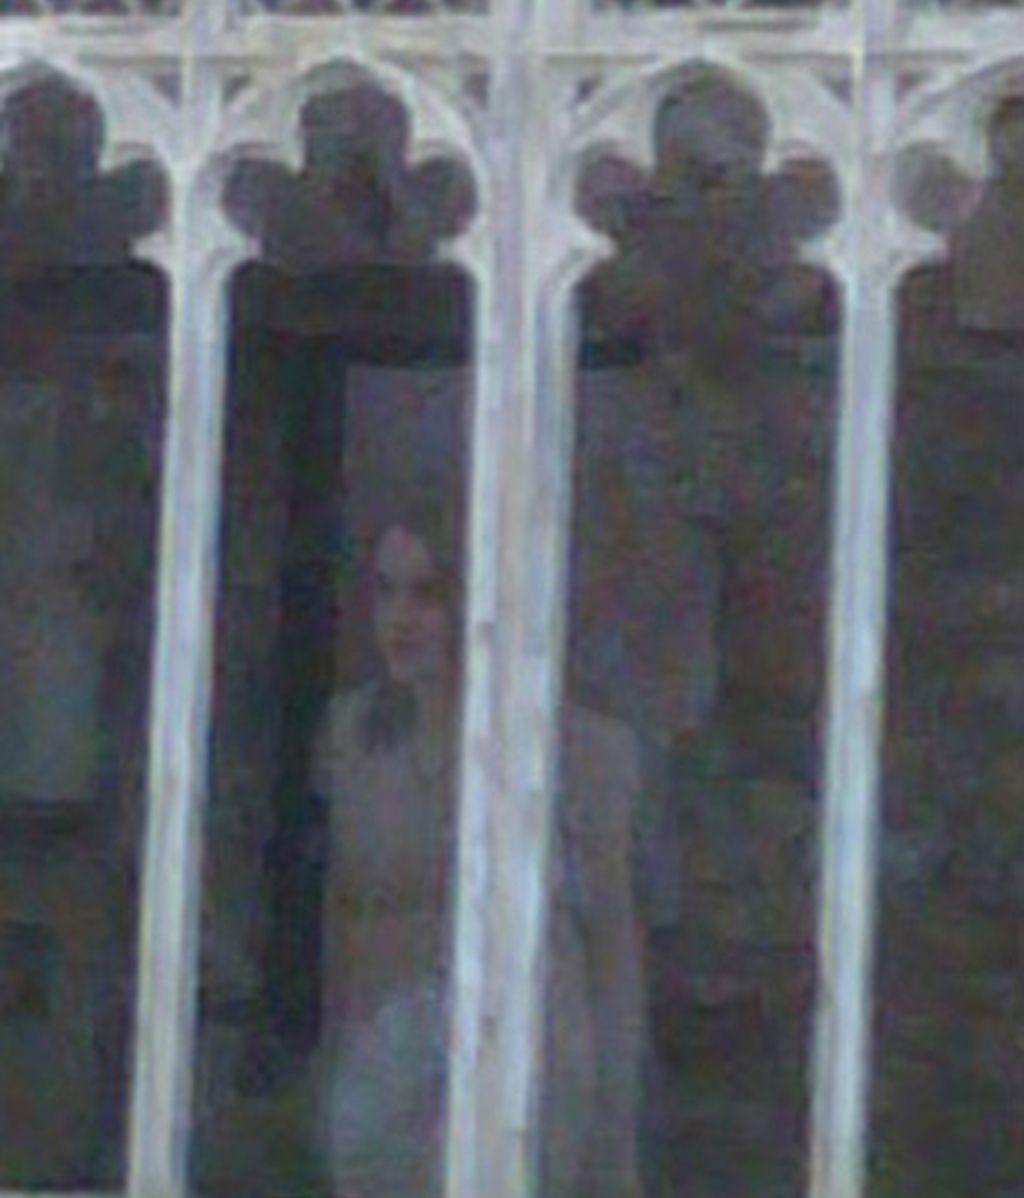 La joven de la ventana